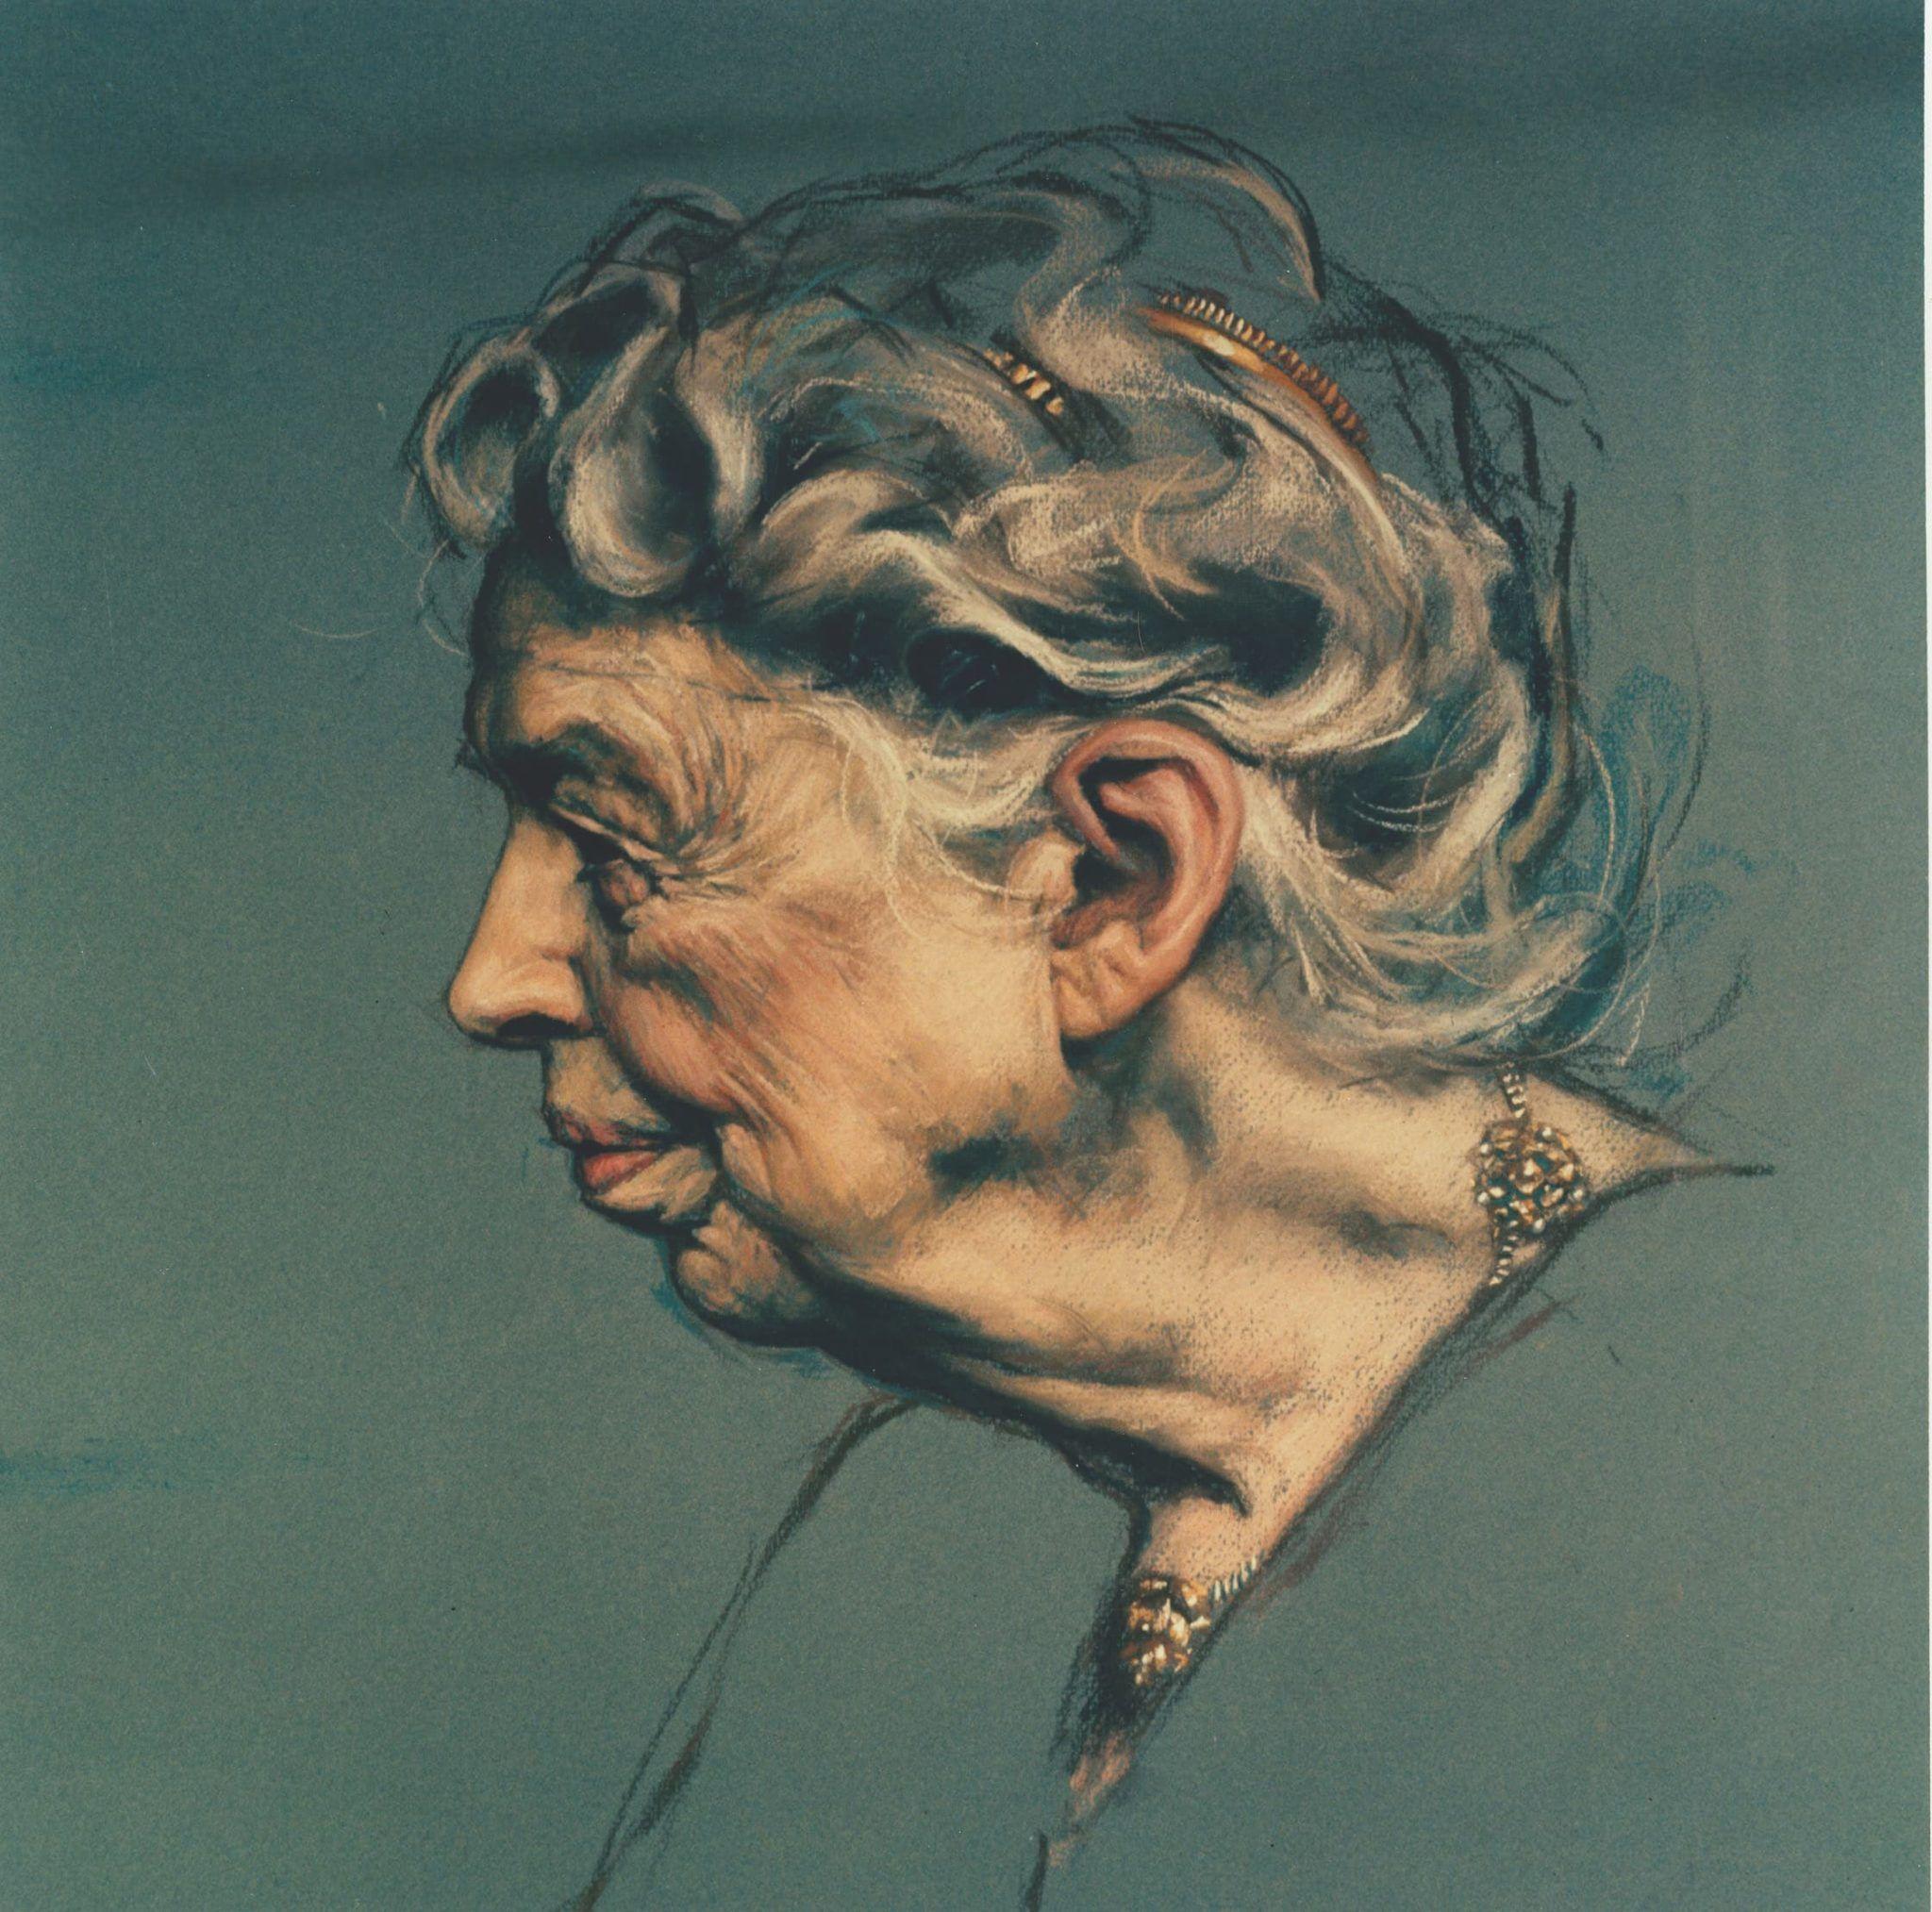 The Art of Daniel E. Greene: Master of Figurative Realism - Artists Network